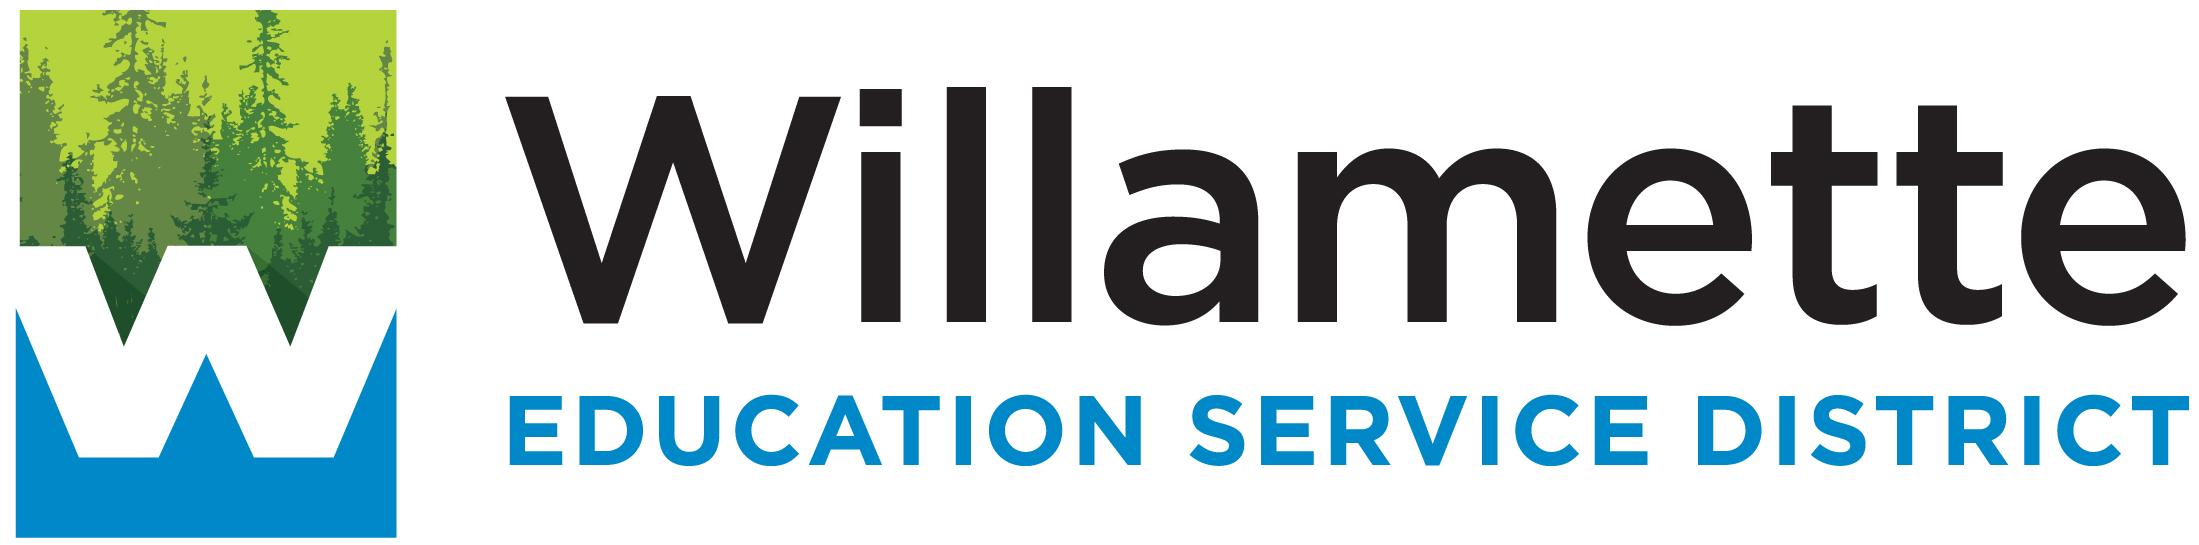 Willamette Education Service District